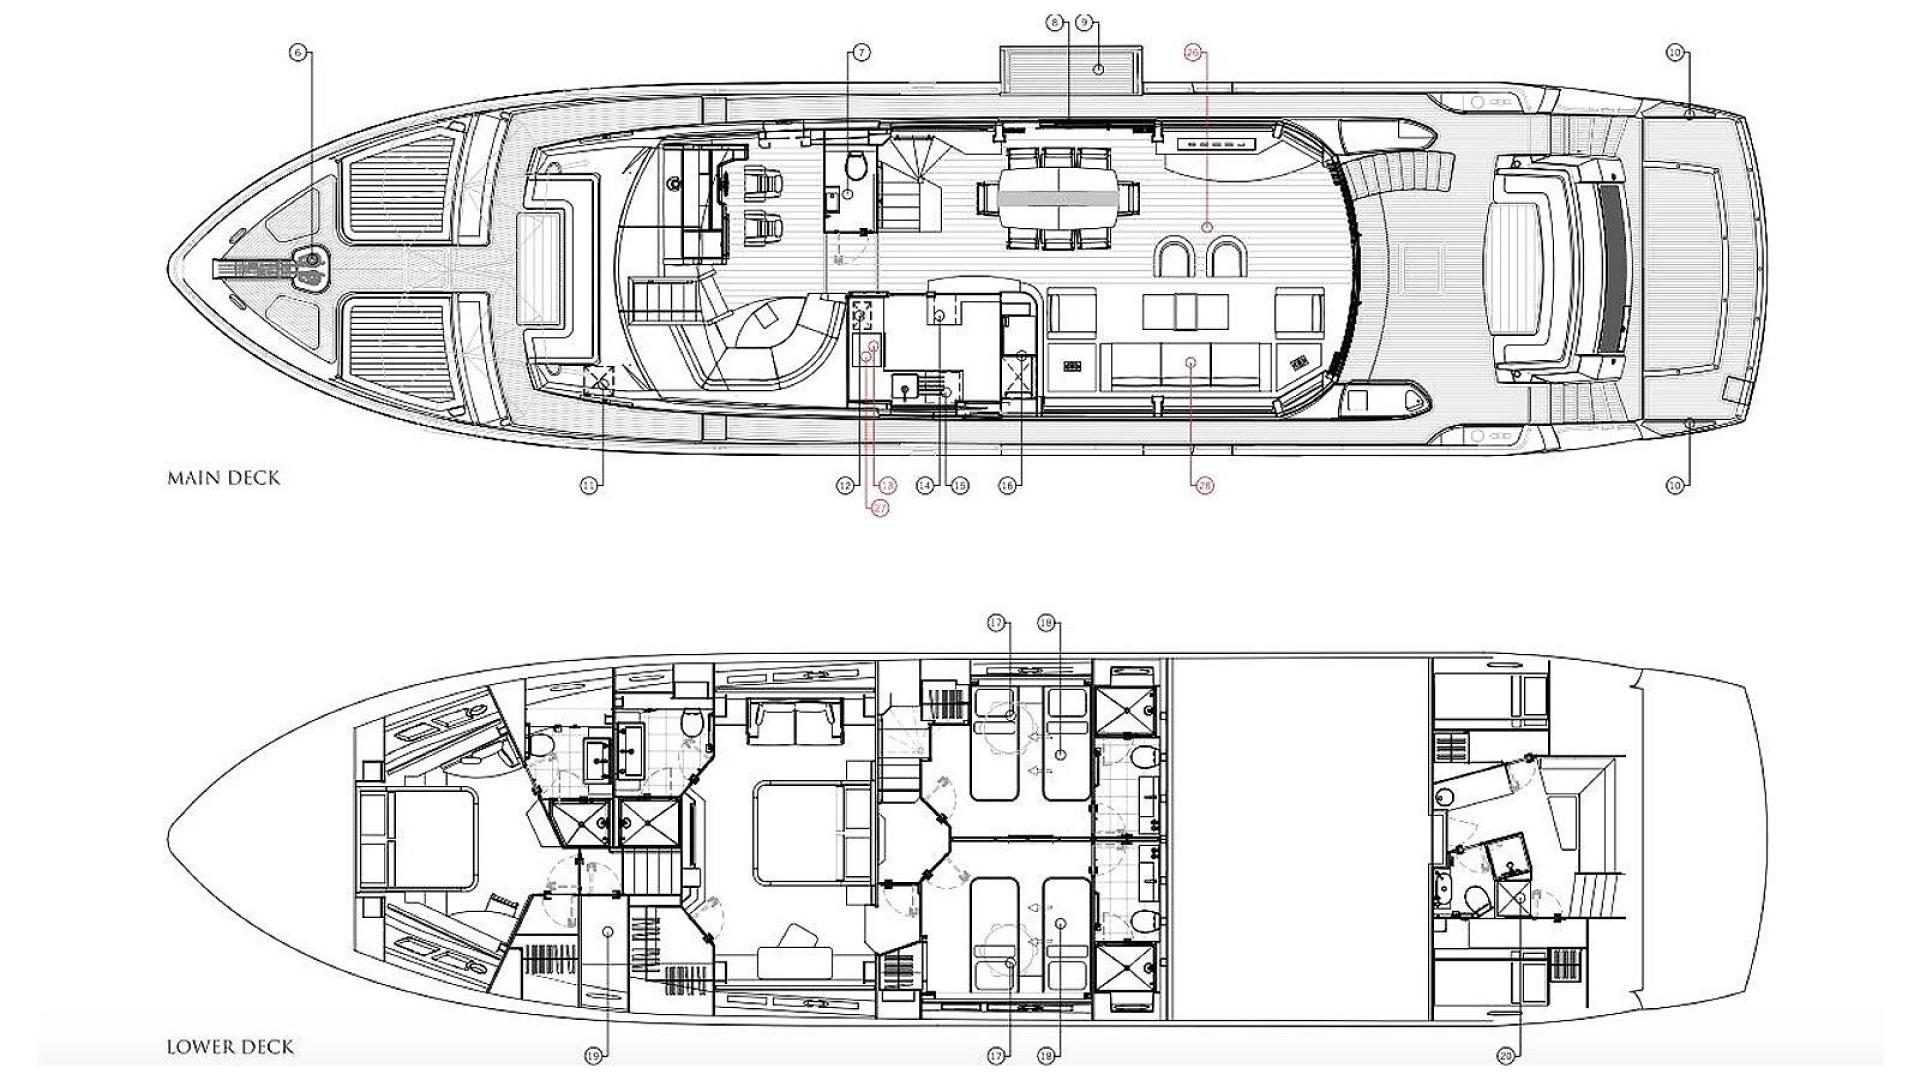 Sunseeker-28 Metre Yacht 2016-RIII Miami-Florida-United States-600133 | Thumbnail